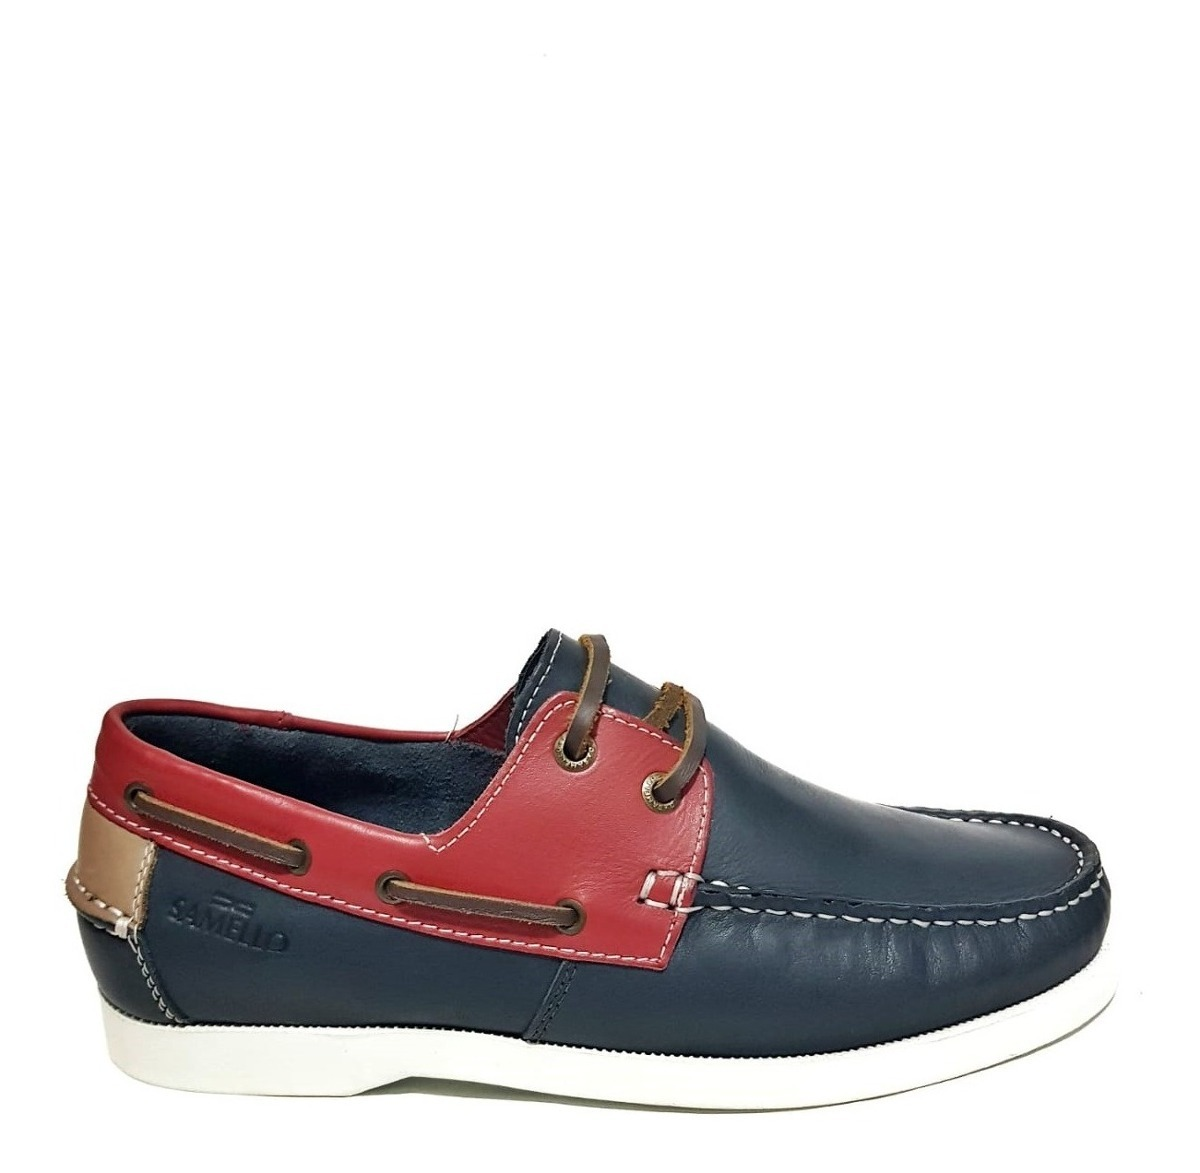 e68eb3c11 Sapato Masculino Dockside Samello Loop Smooth - R$ 274,90 em Mercado Livre